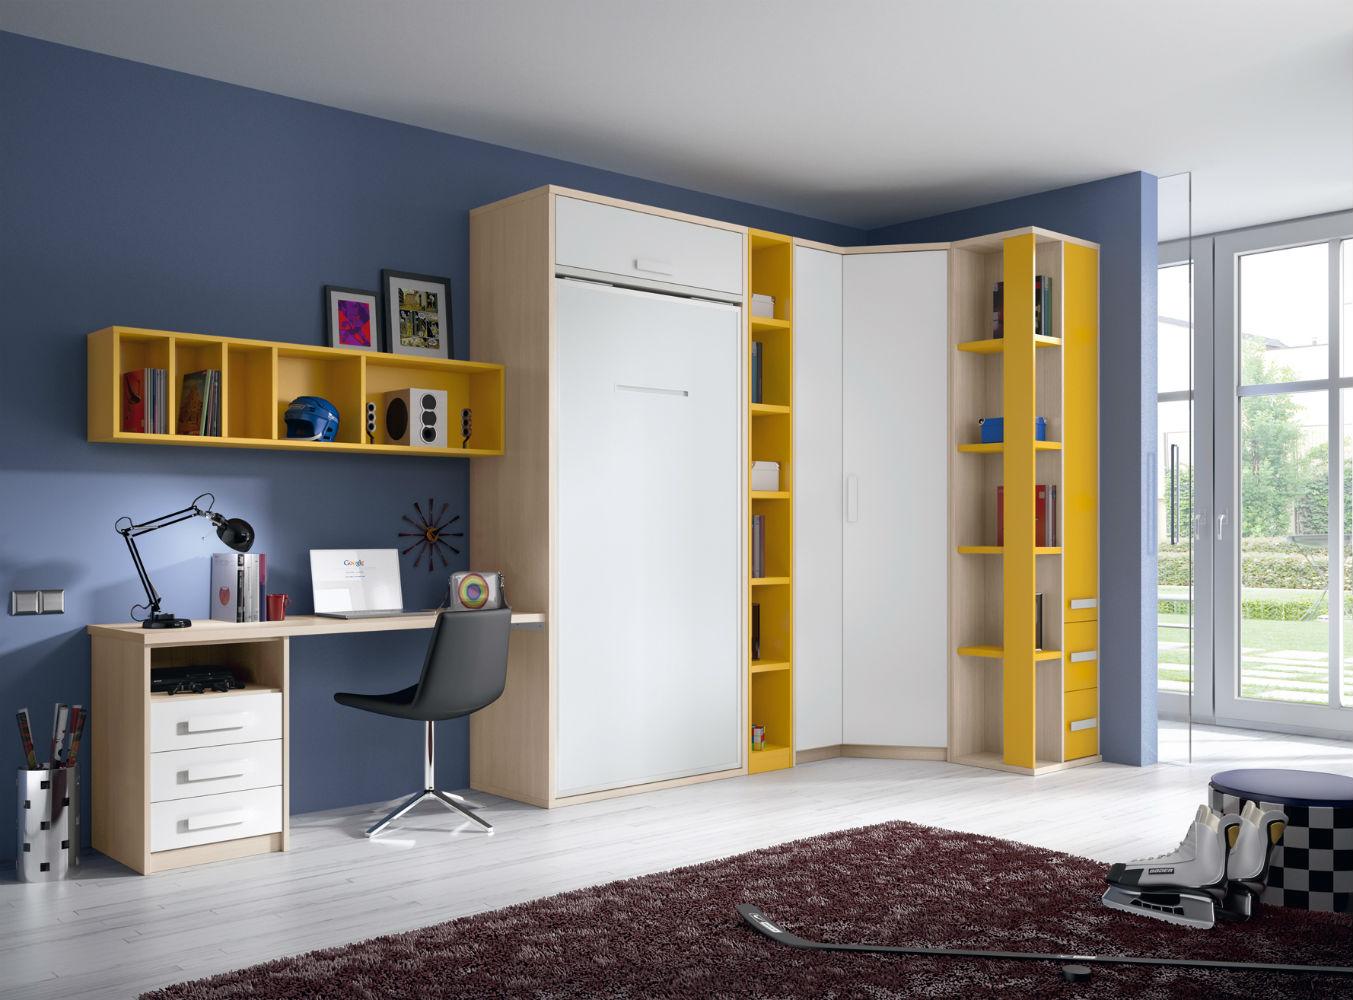 Dormitorio infantil juvenil moderno literas abatibles 69 f224 - Camas juveniles modernas ...